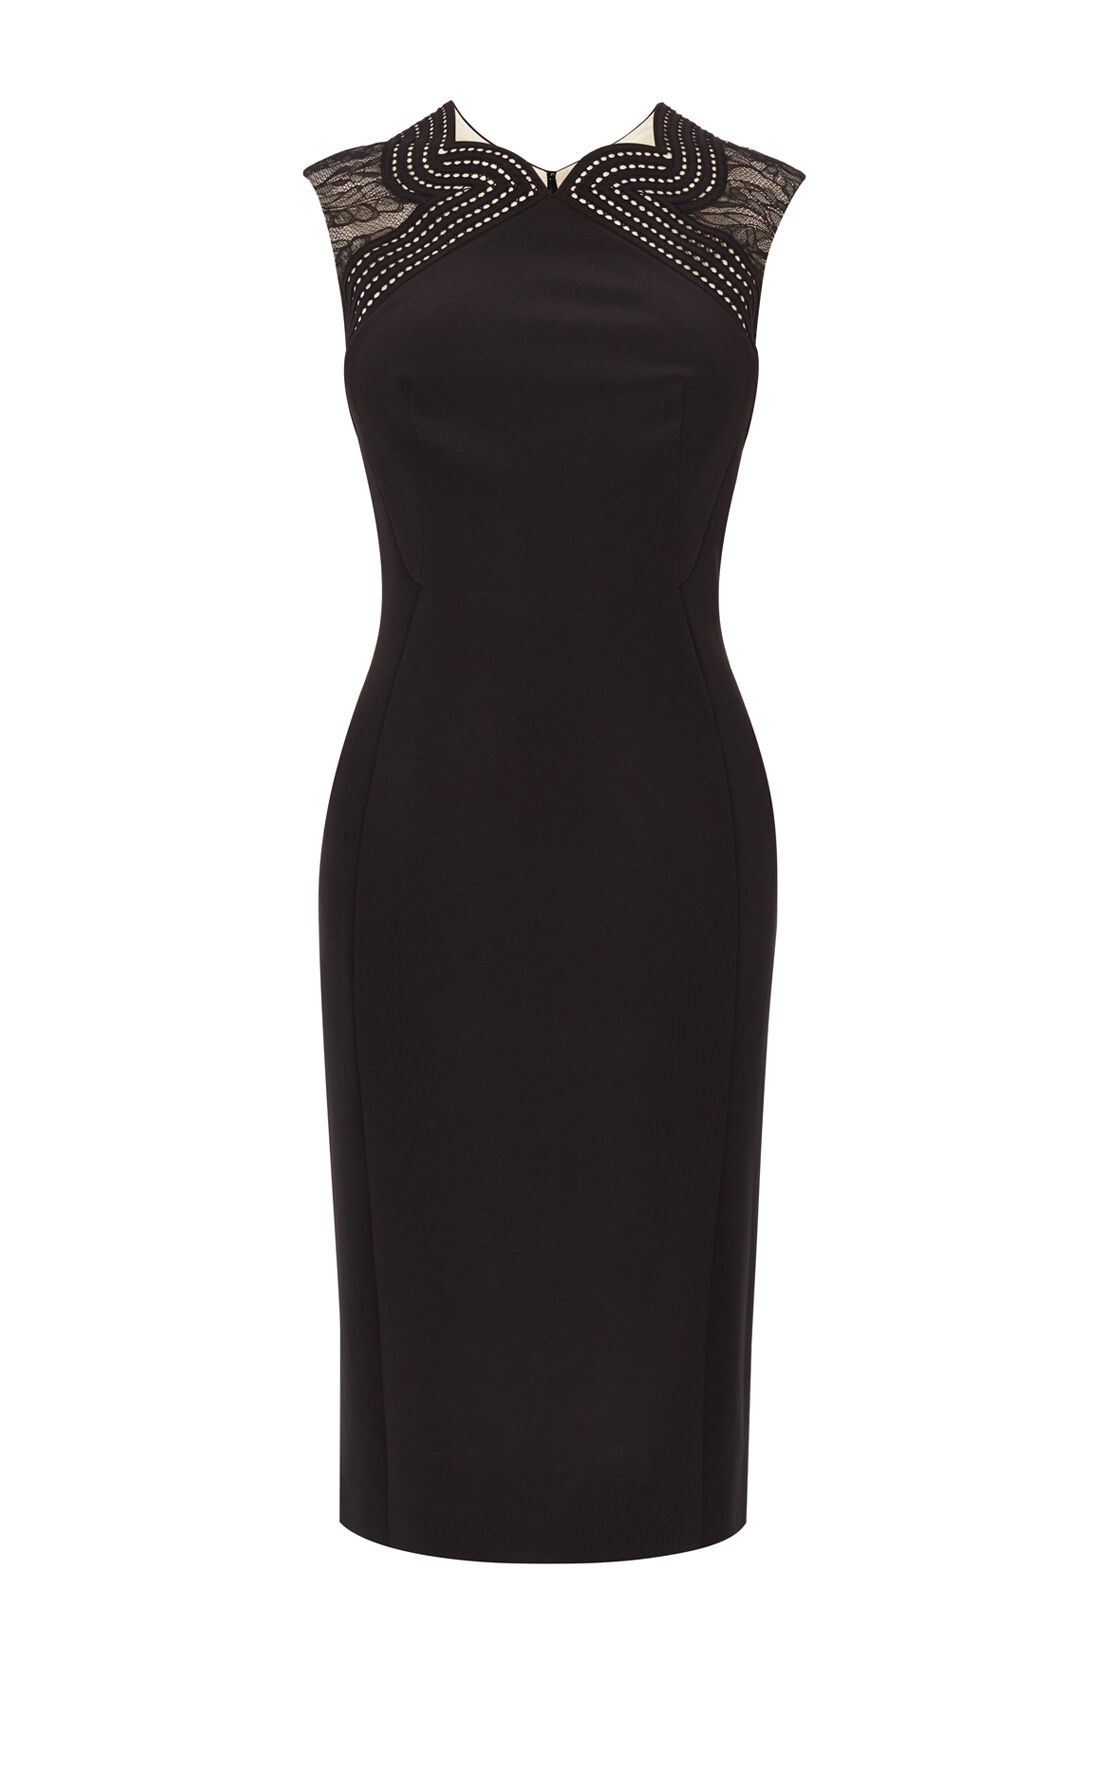 Karen Millen, LACE PANEL DRESS Black/Multi 0